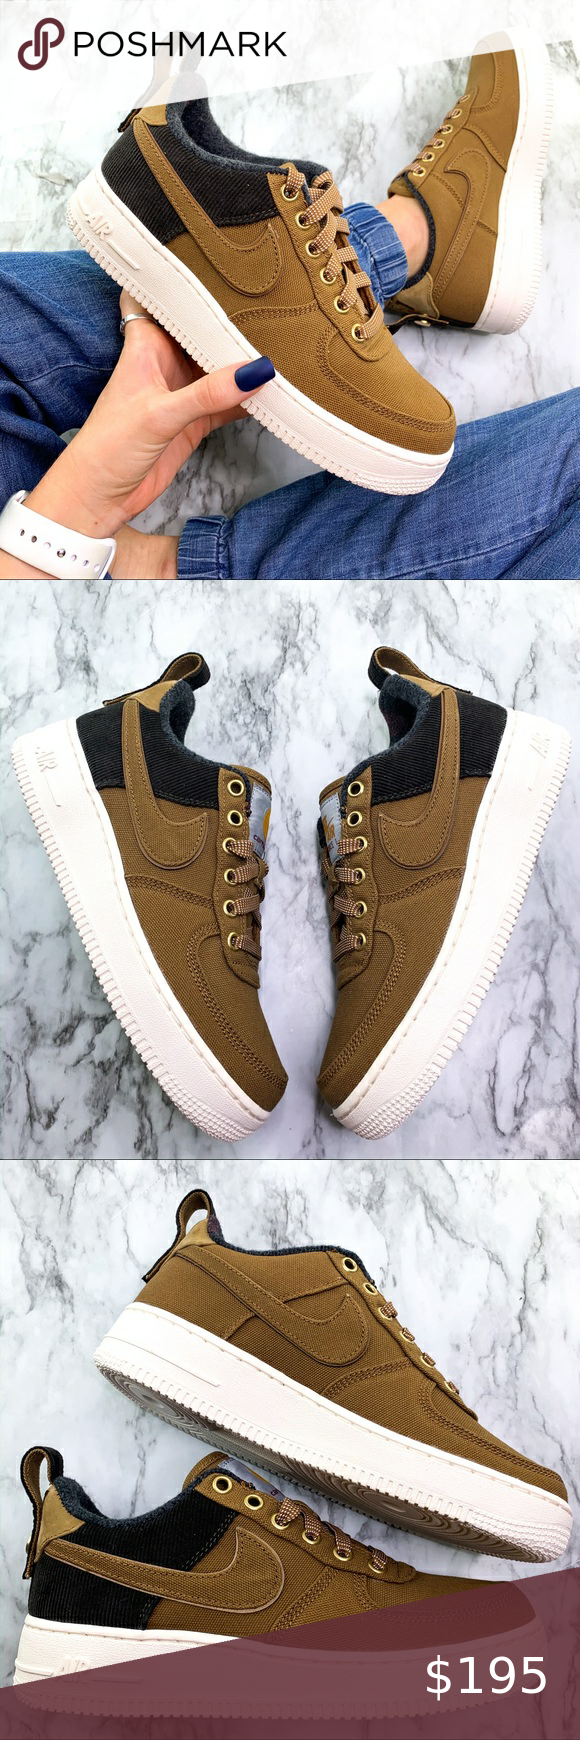 Nike air force, Nike air, Brown sneakers